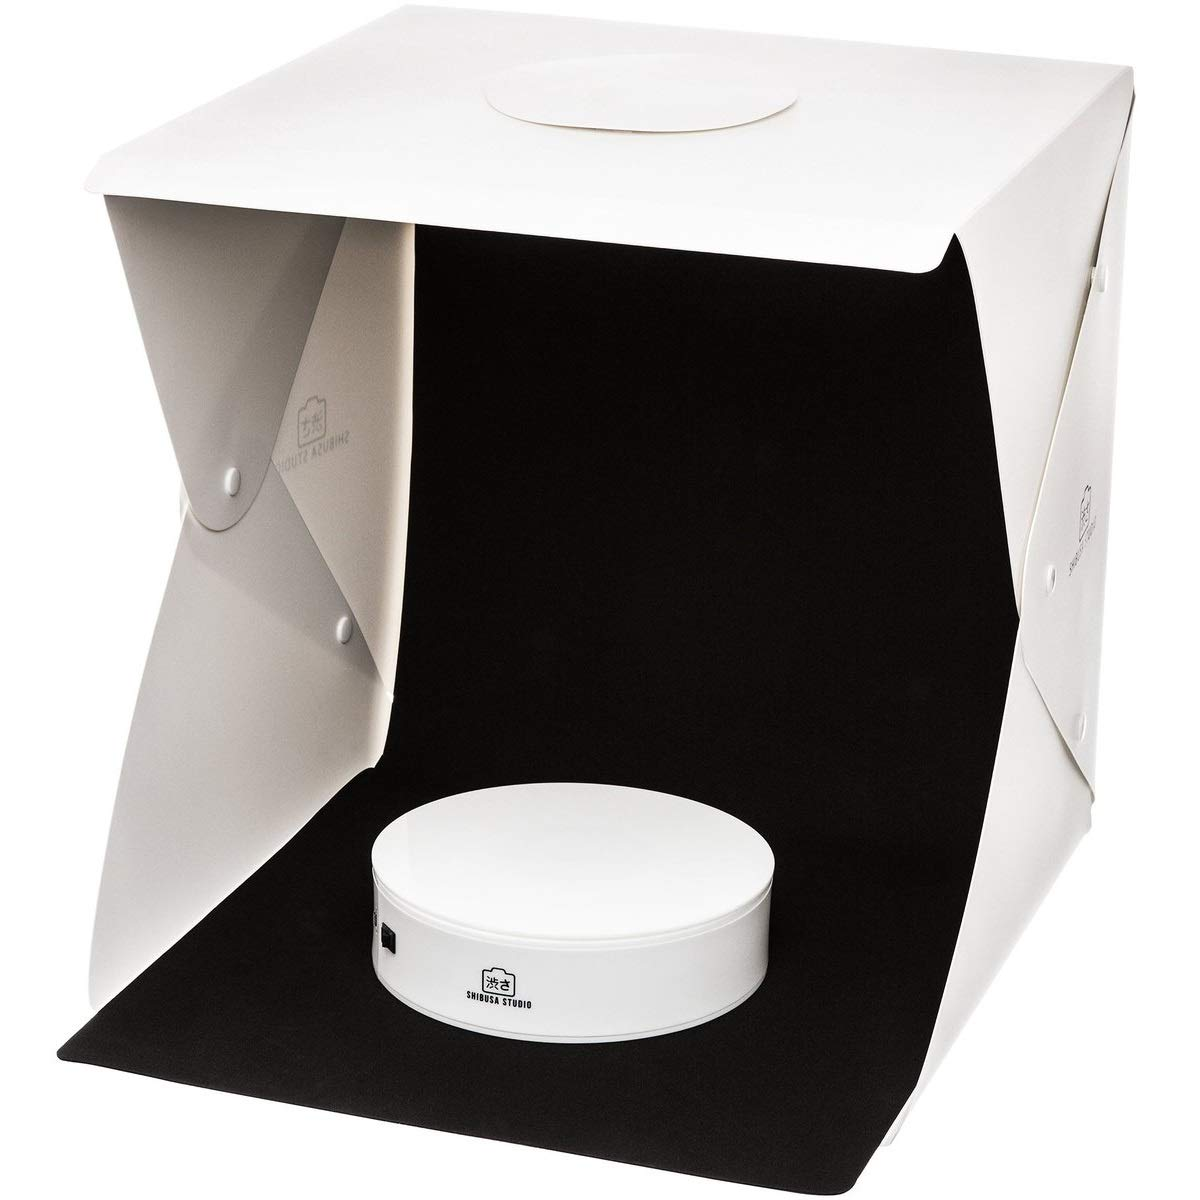 Large Shibusa Home Photo Studio Lightbox with Bonus 360/° Turntable